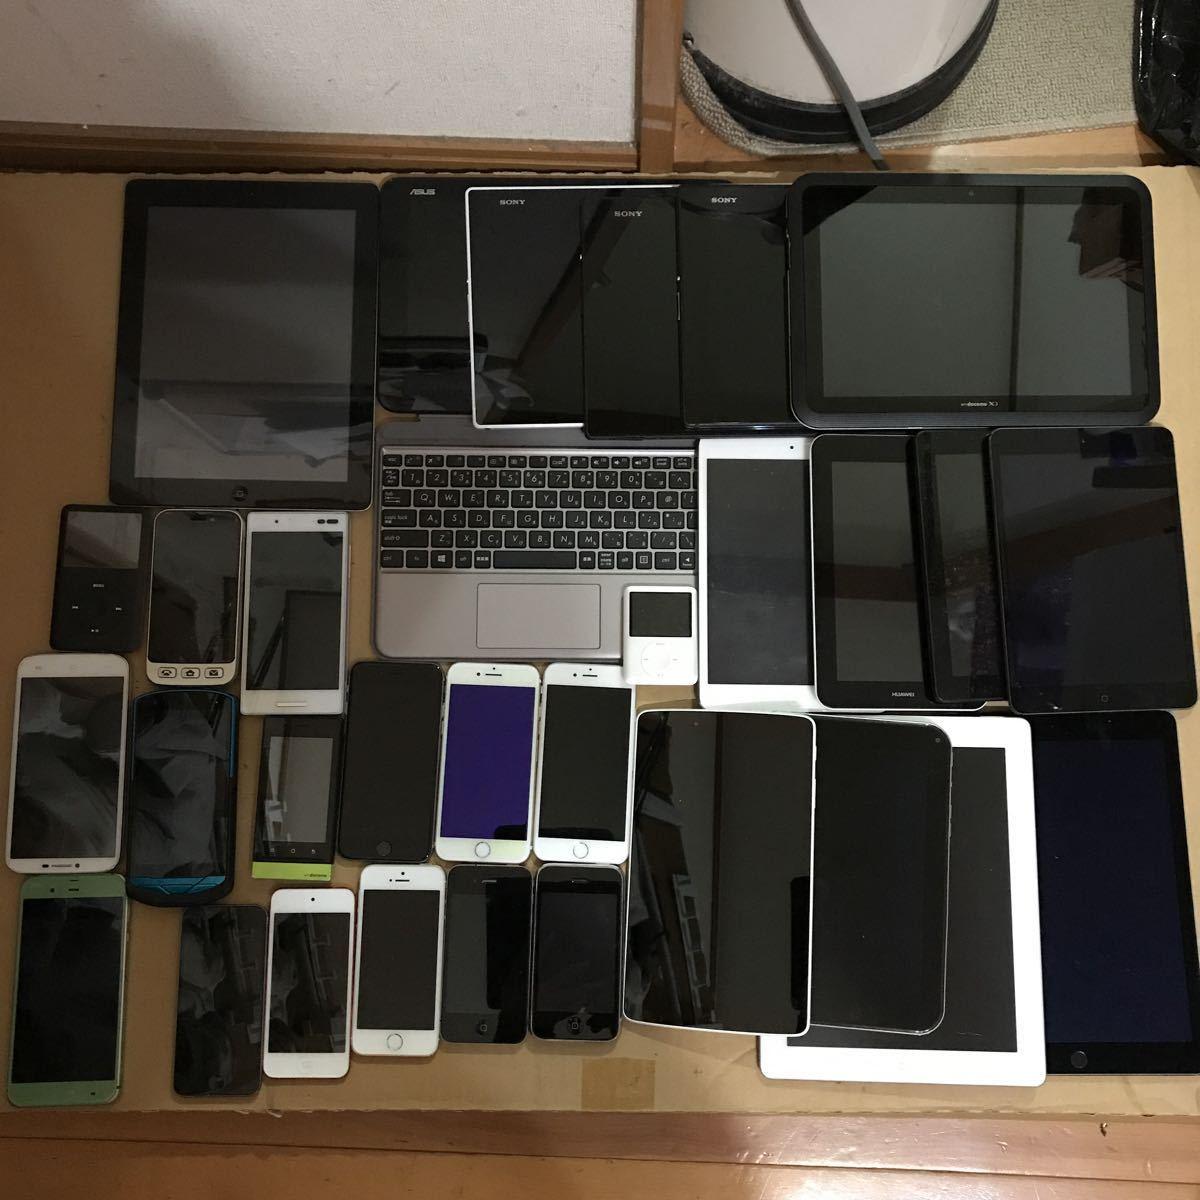 Tablet タブレット スマホ スマートフォン iPhone iPad iPod xperia arrows asus HUAWEI AQUOS docomo ジャンク まとめ 大量 1円_画像1